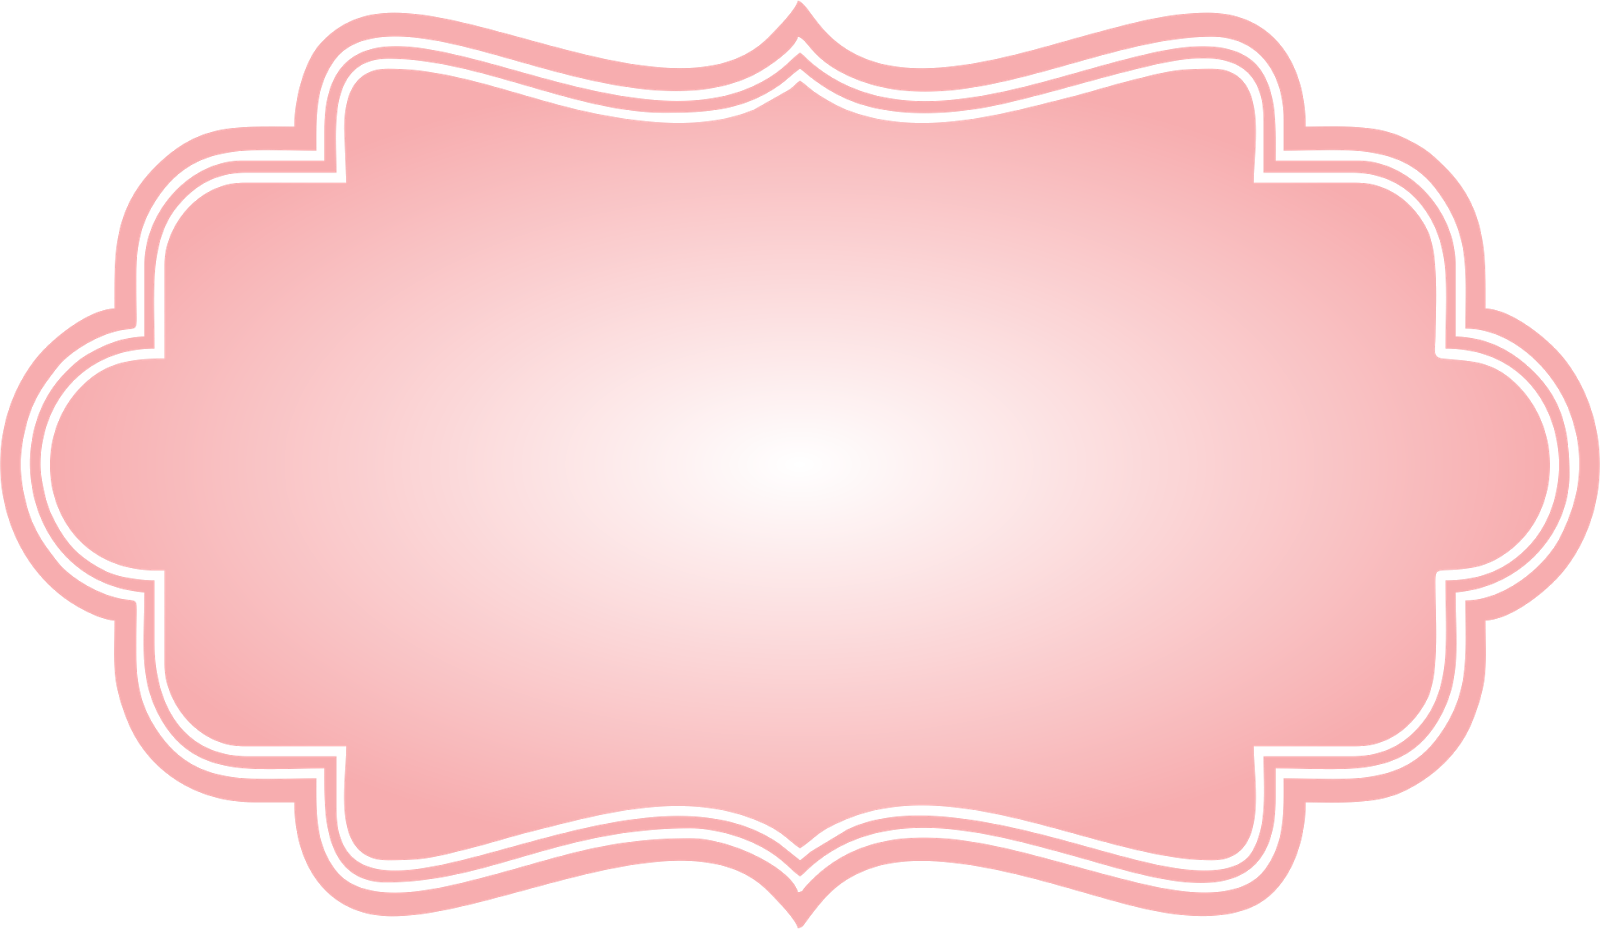 Papel Decorativo Reposteria Redondo